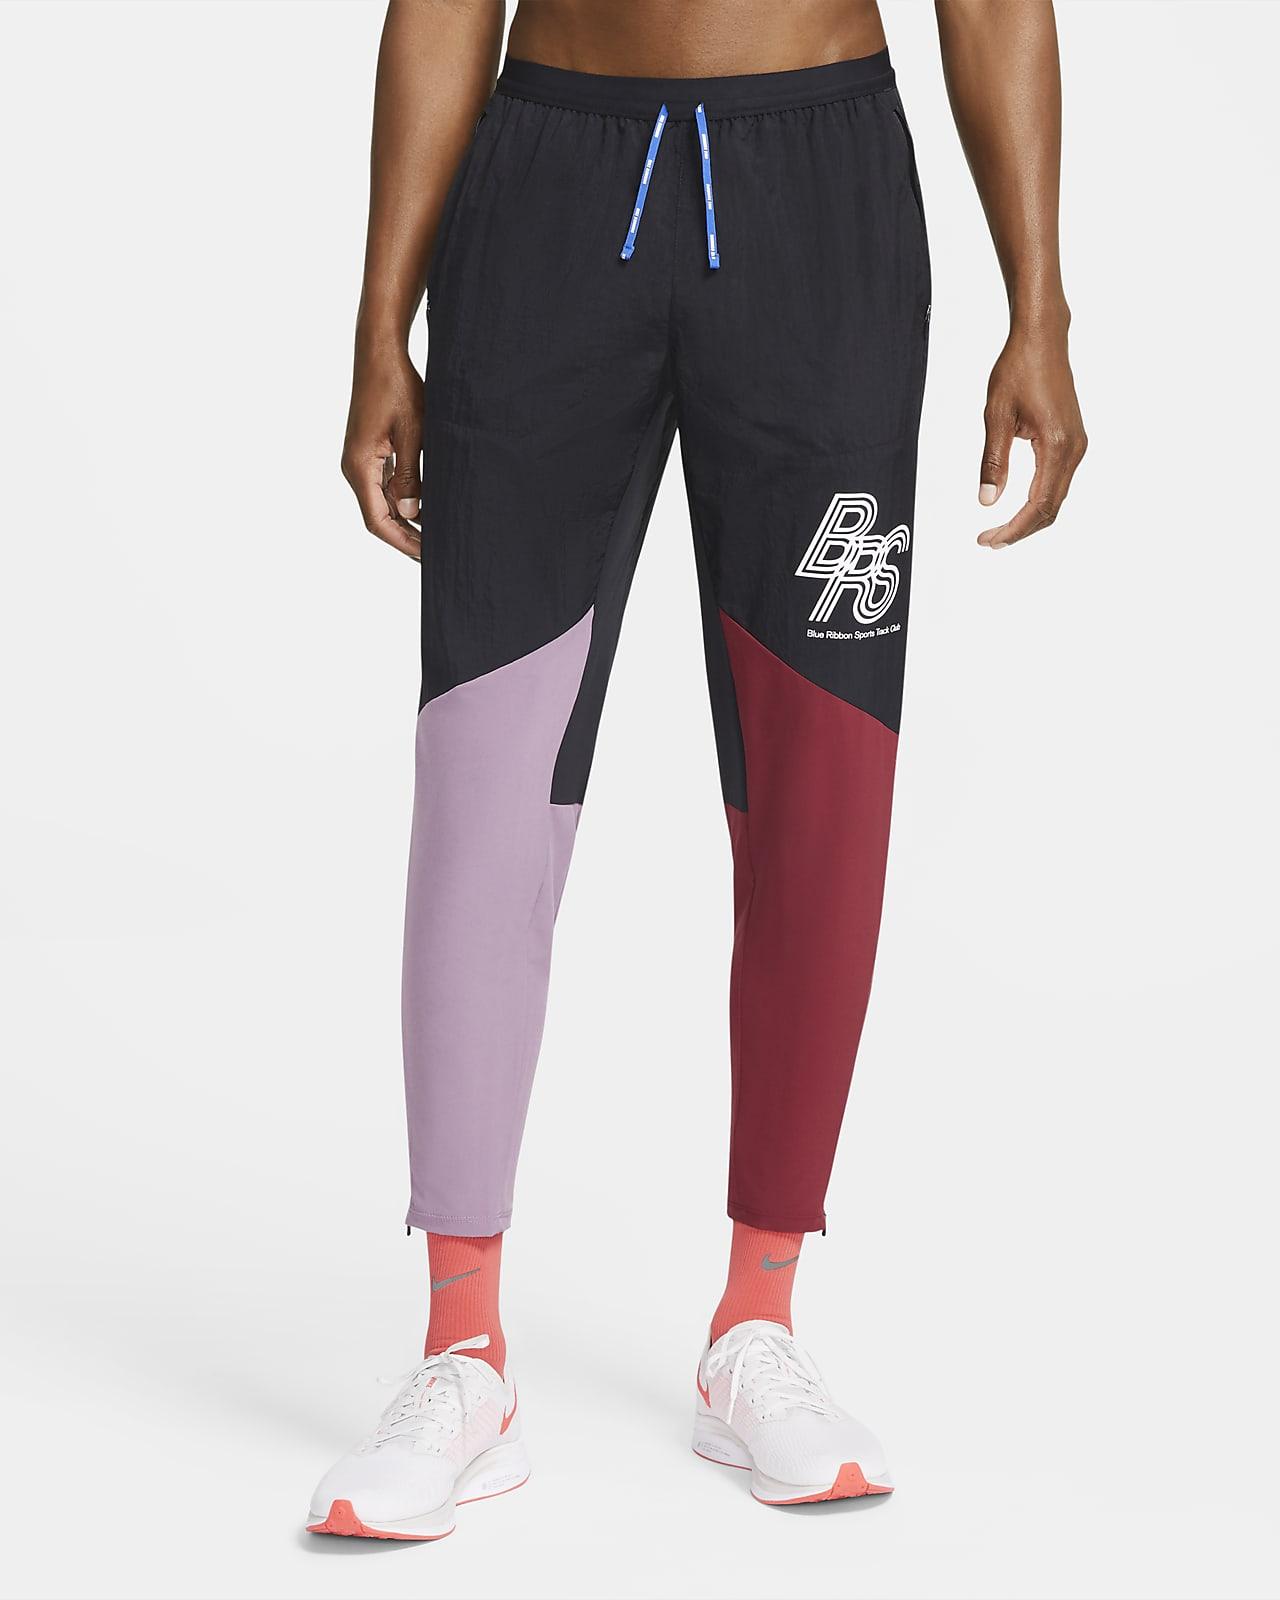 Nike Phenom Elite BRS Dokuma Erkek Koşu Eşofman Altı